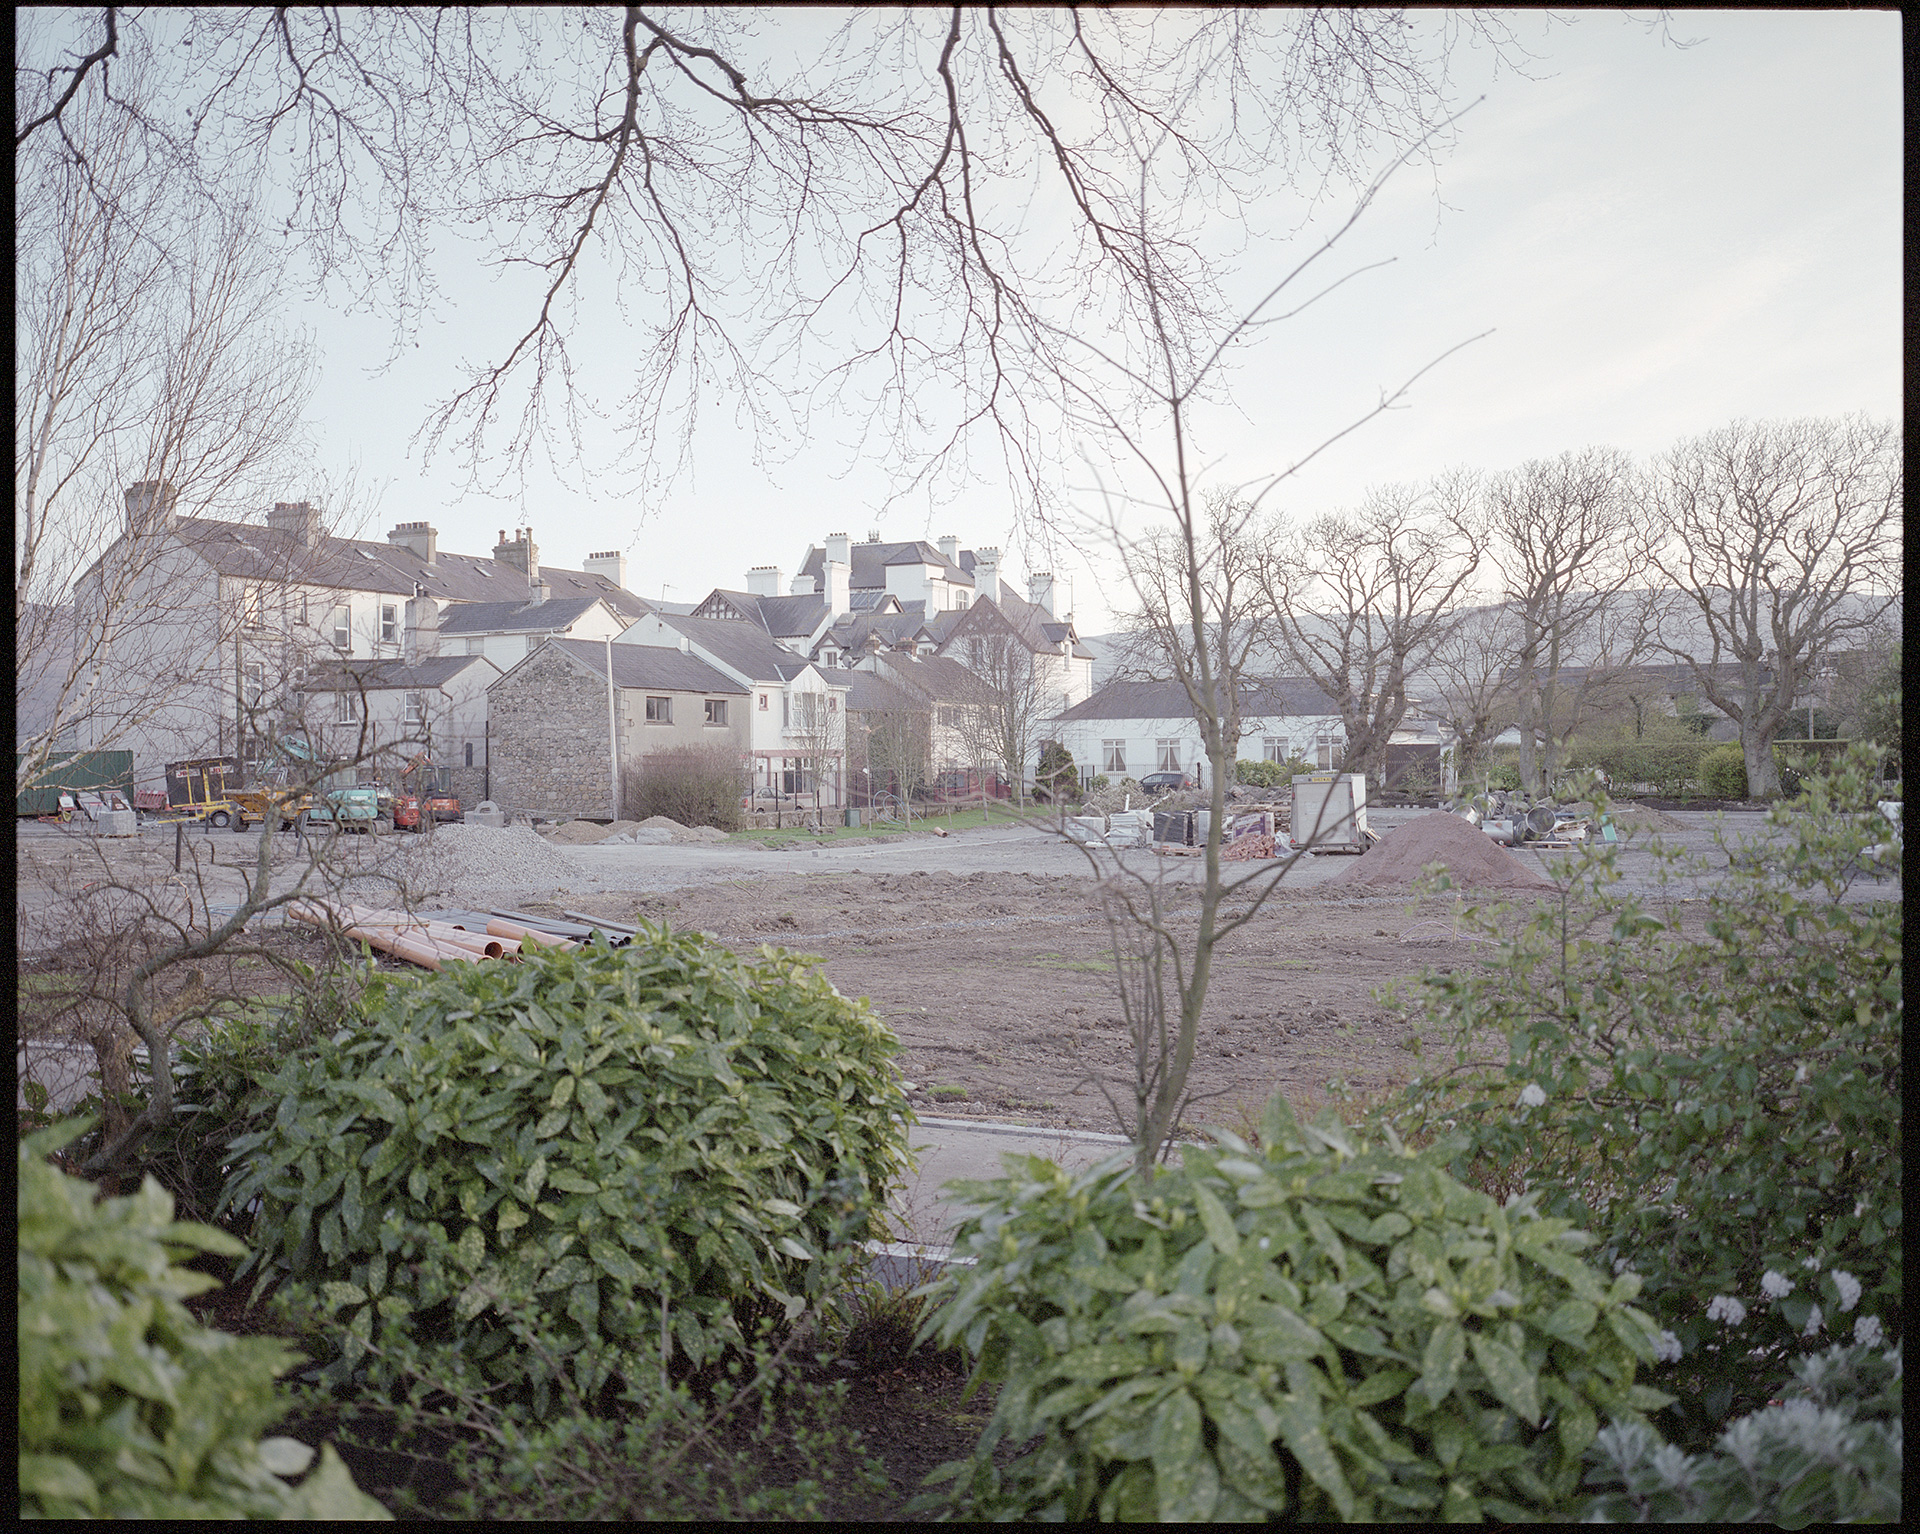 IrelandScotland_77.jpg